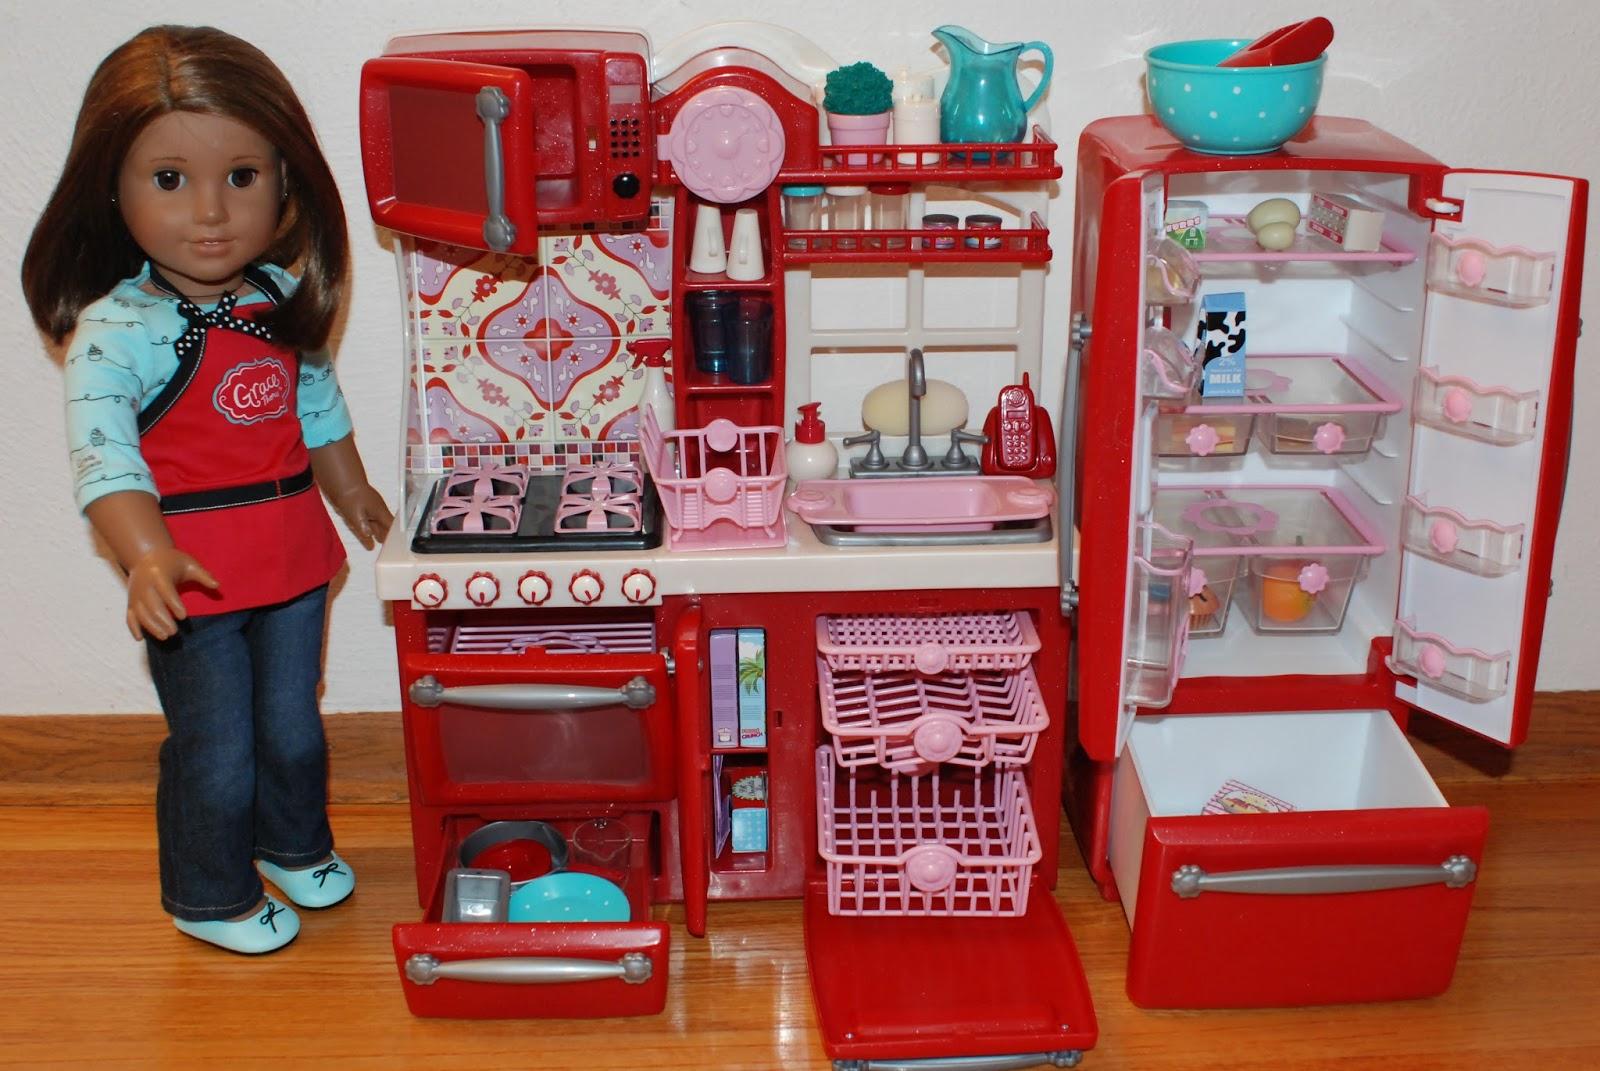 Darling Dolls: Our Generation Kitchen!